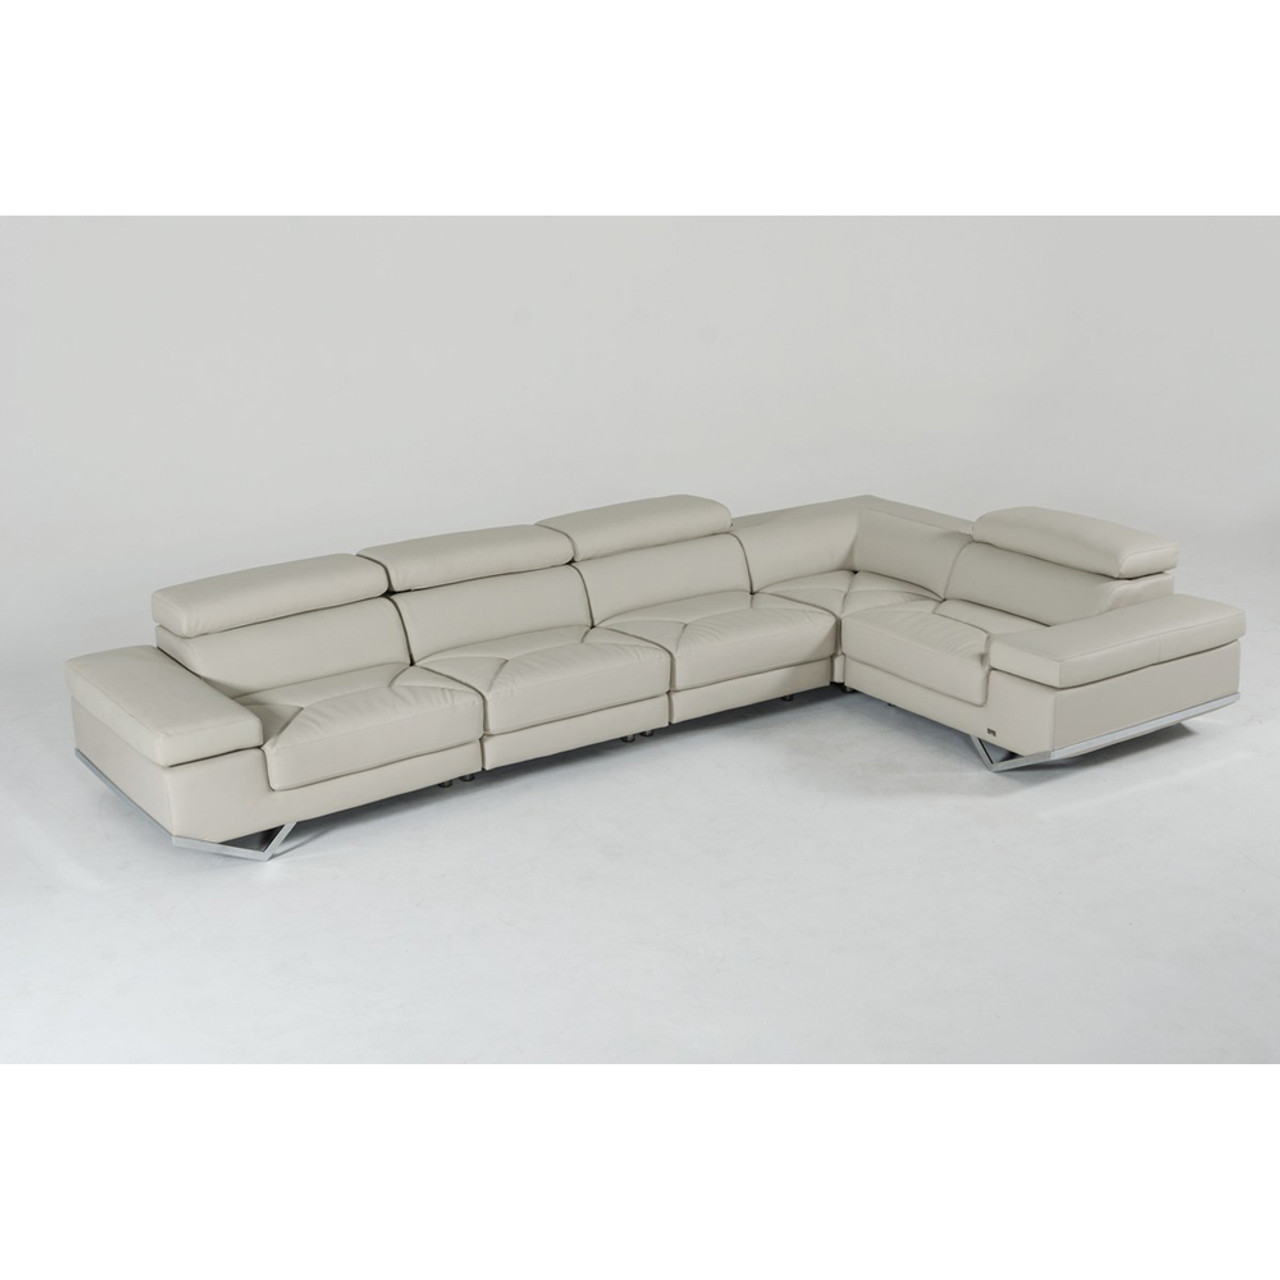 Divani Casa Kerria Modern Light Grey Eco-Leather Sectional Sofa